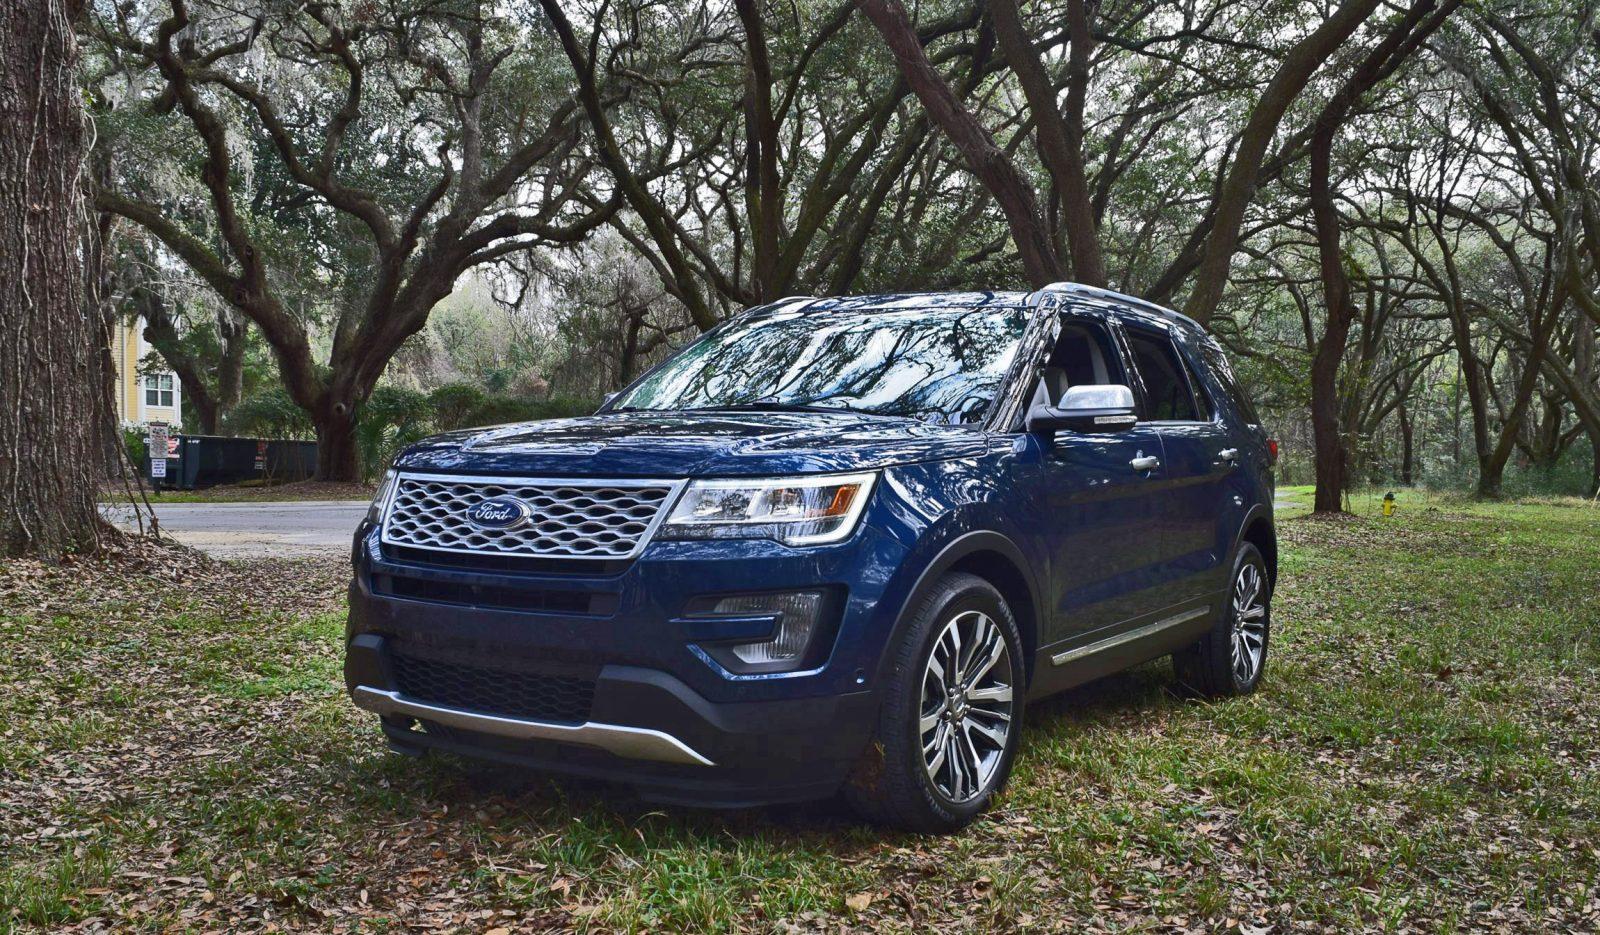 2017 Ford Explorer Platinum 4 Hd Road Test Review